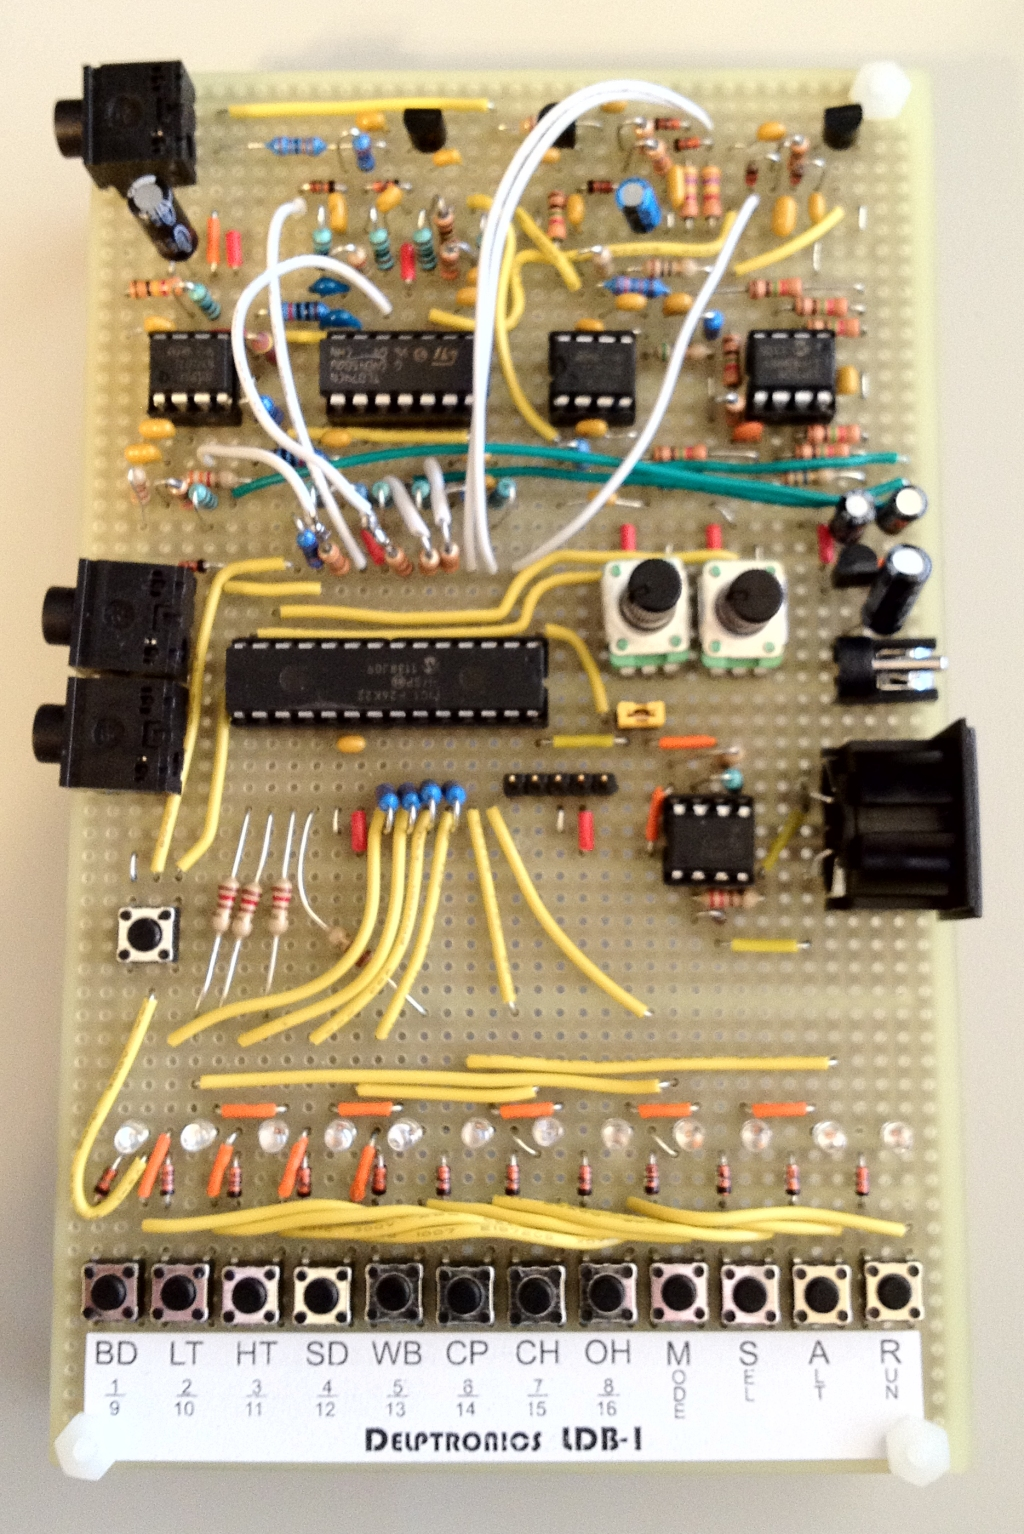 Anatomy Of A Drum Machine Mickey Delp Dot Com Printing Prices Buy Circuit Board Machinecircuit Ldb 1 Prototype